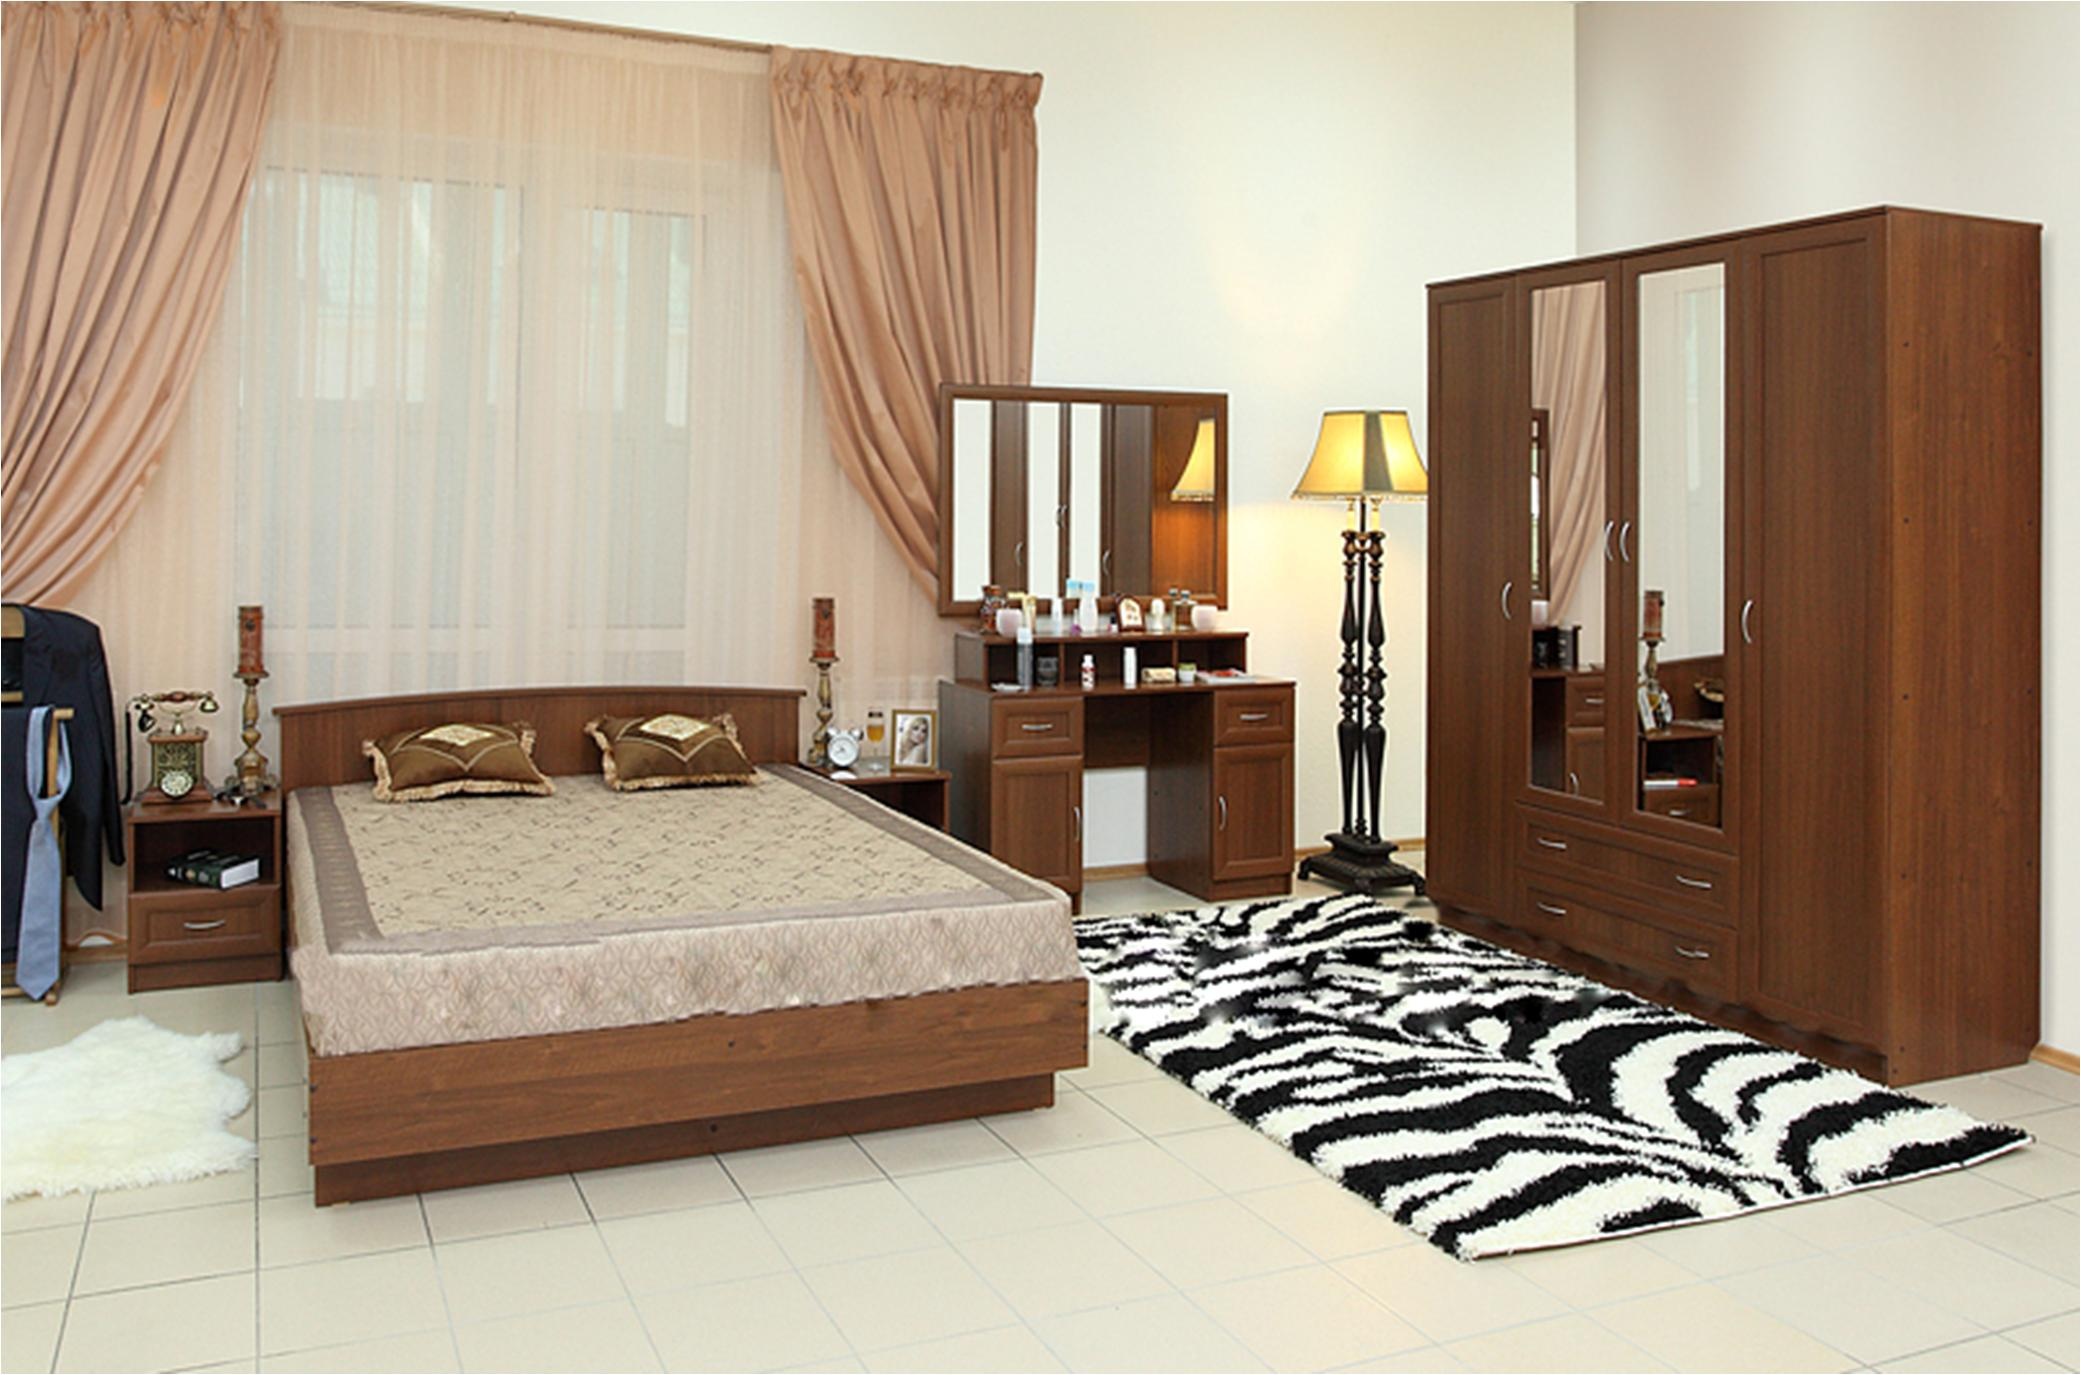 Спальня Светлана-М3 спальня светлана 2